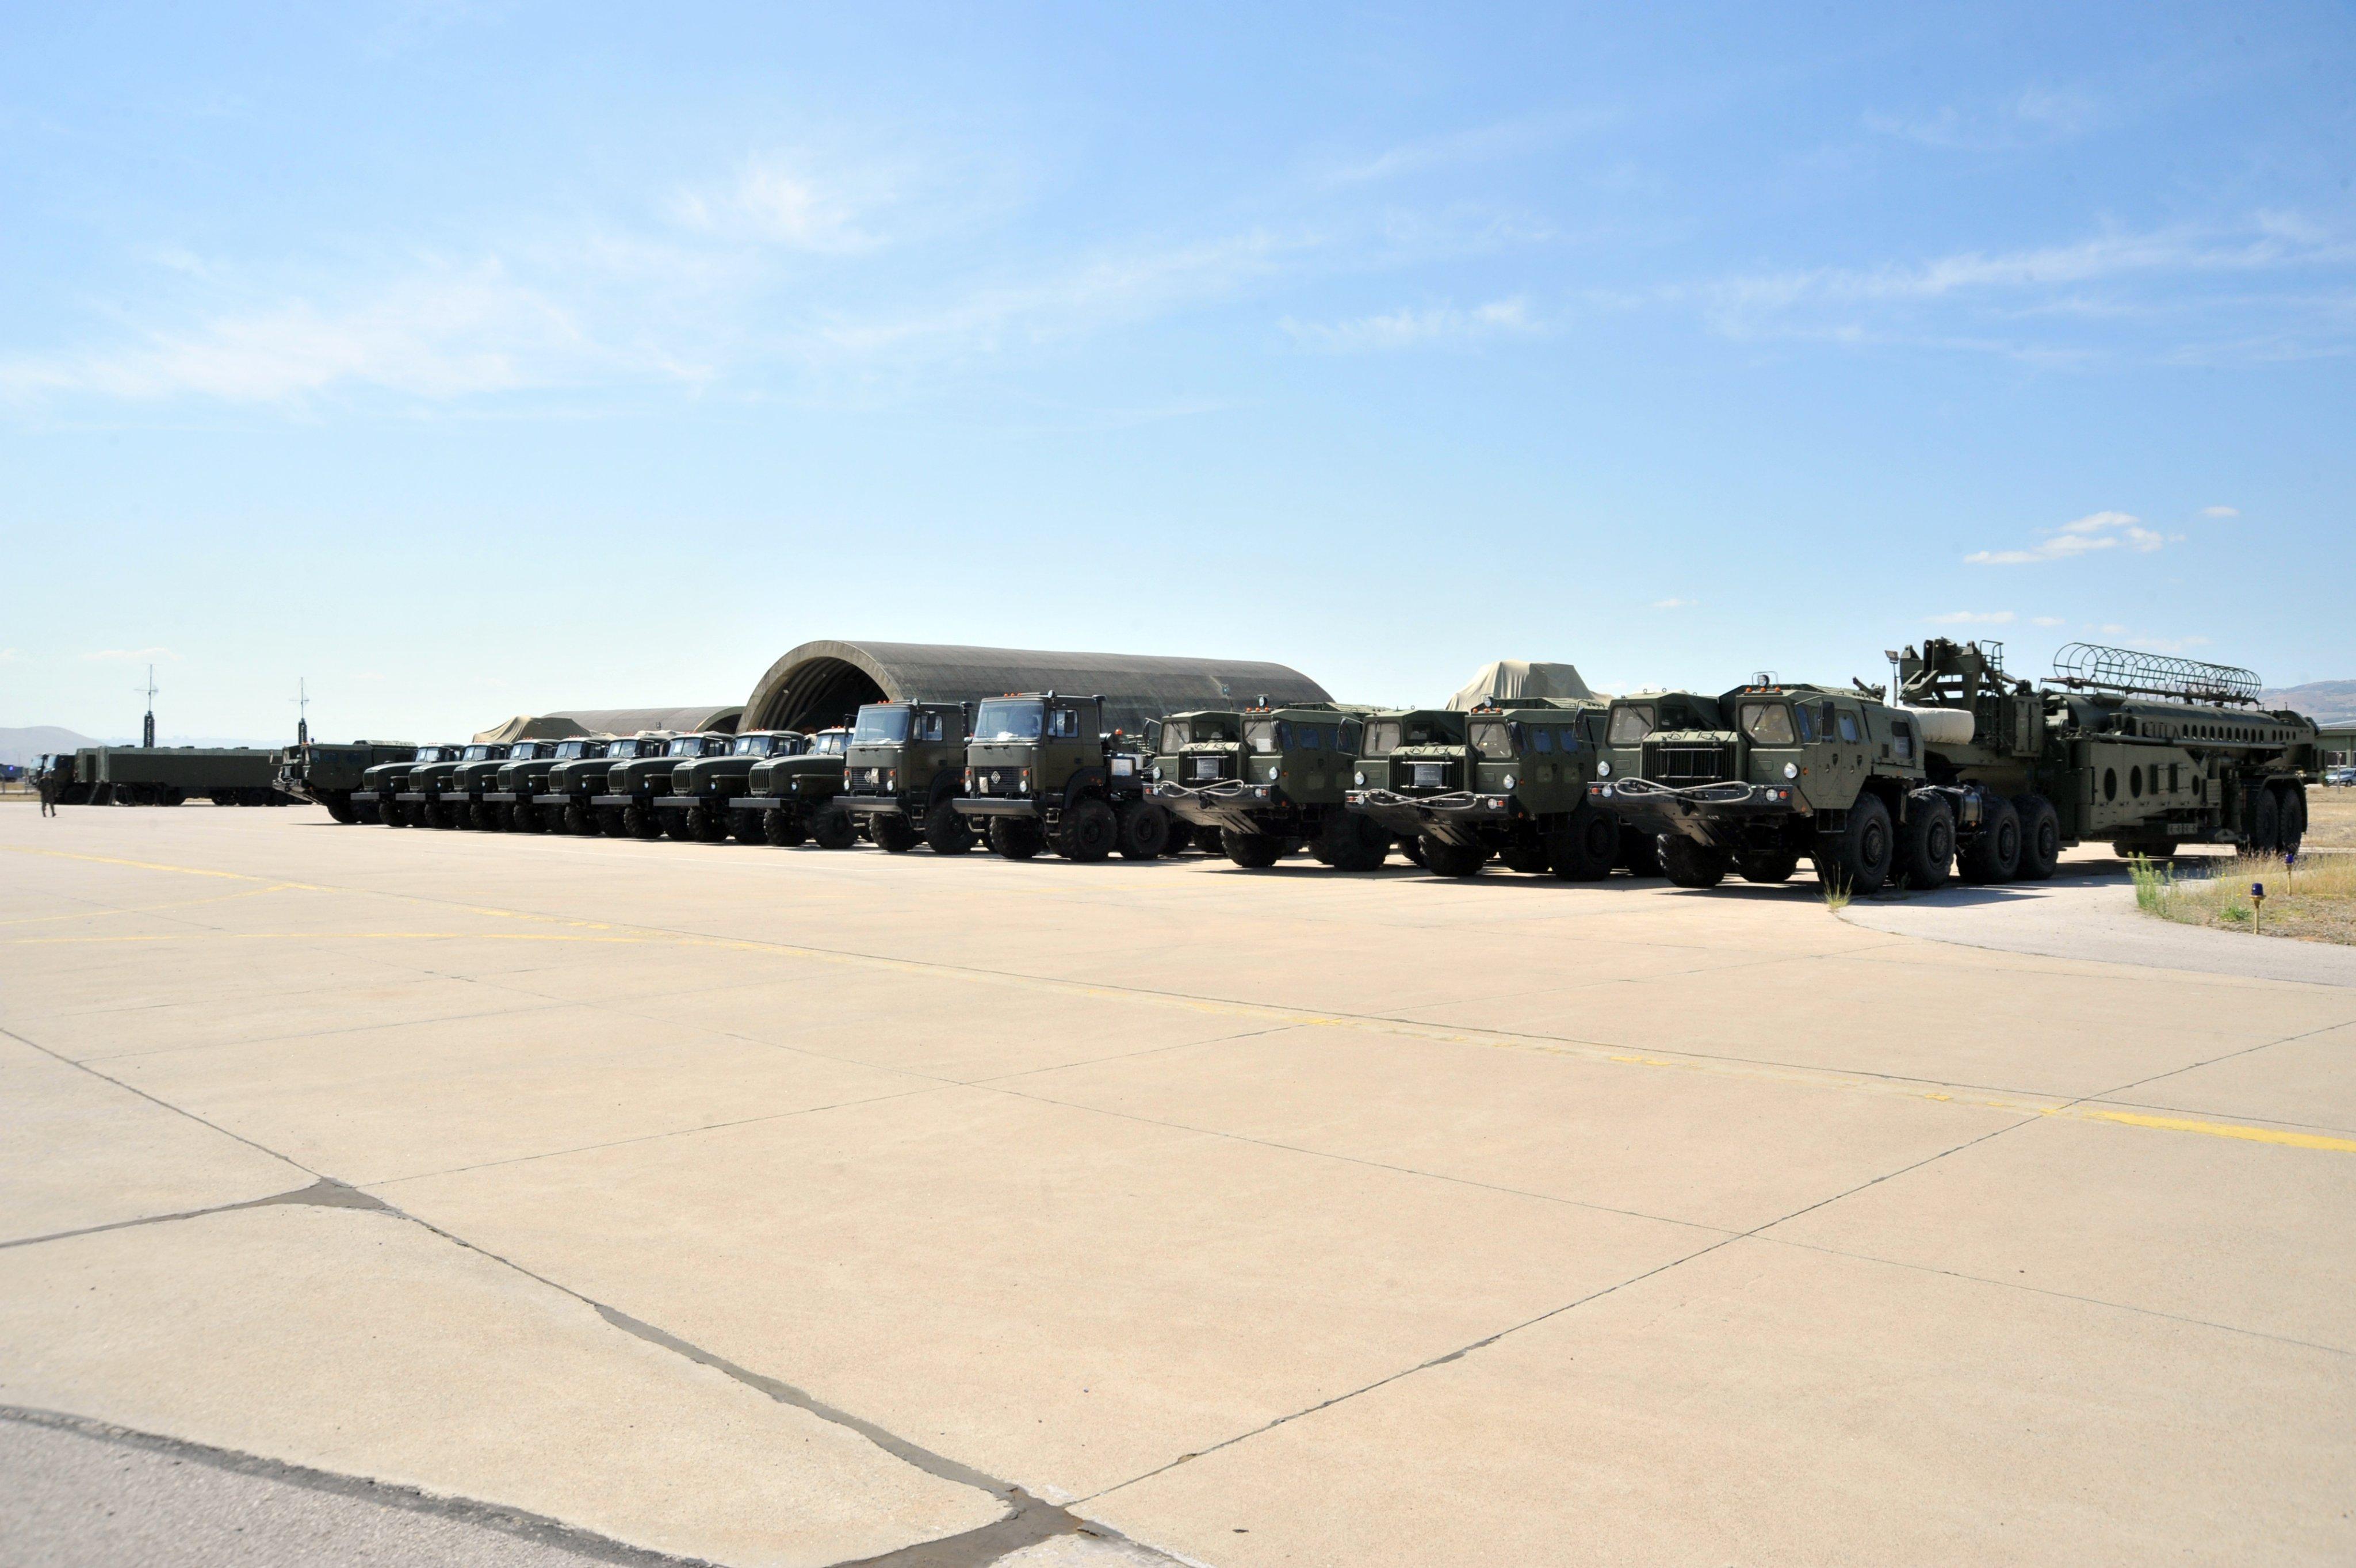 Russia-Turkey S-400 missile deal - Page 4 EEf0S0tWwAELTdU?format=jpg&name=4096x4096